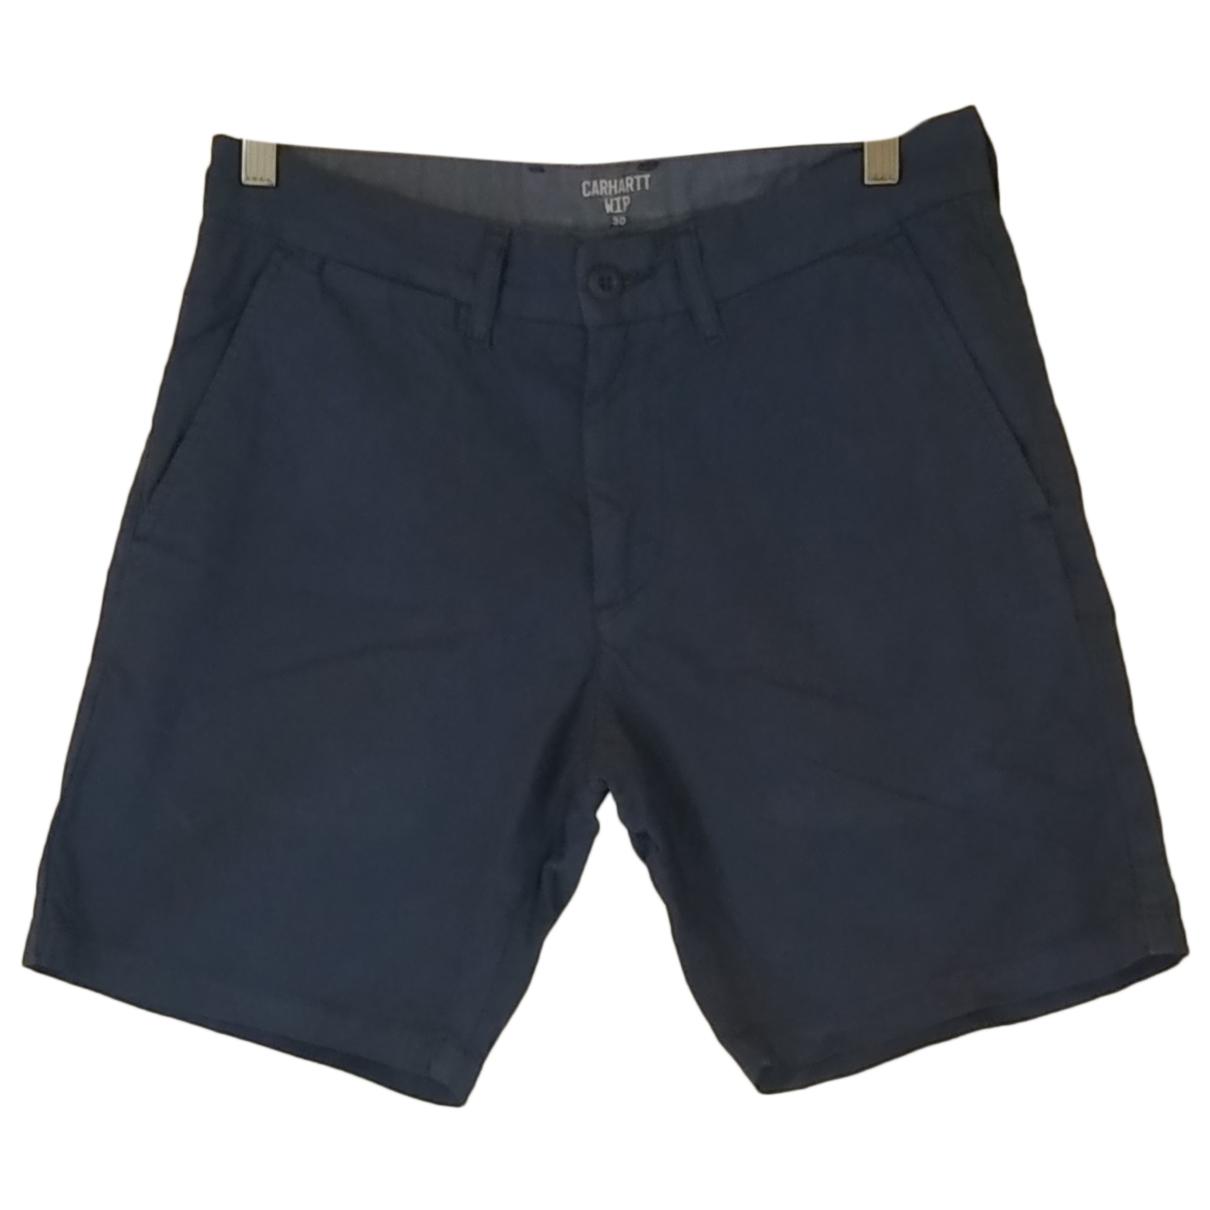 Carhartt N Blue Cotton Shorts for Men M International